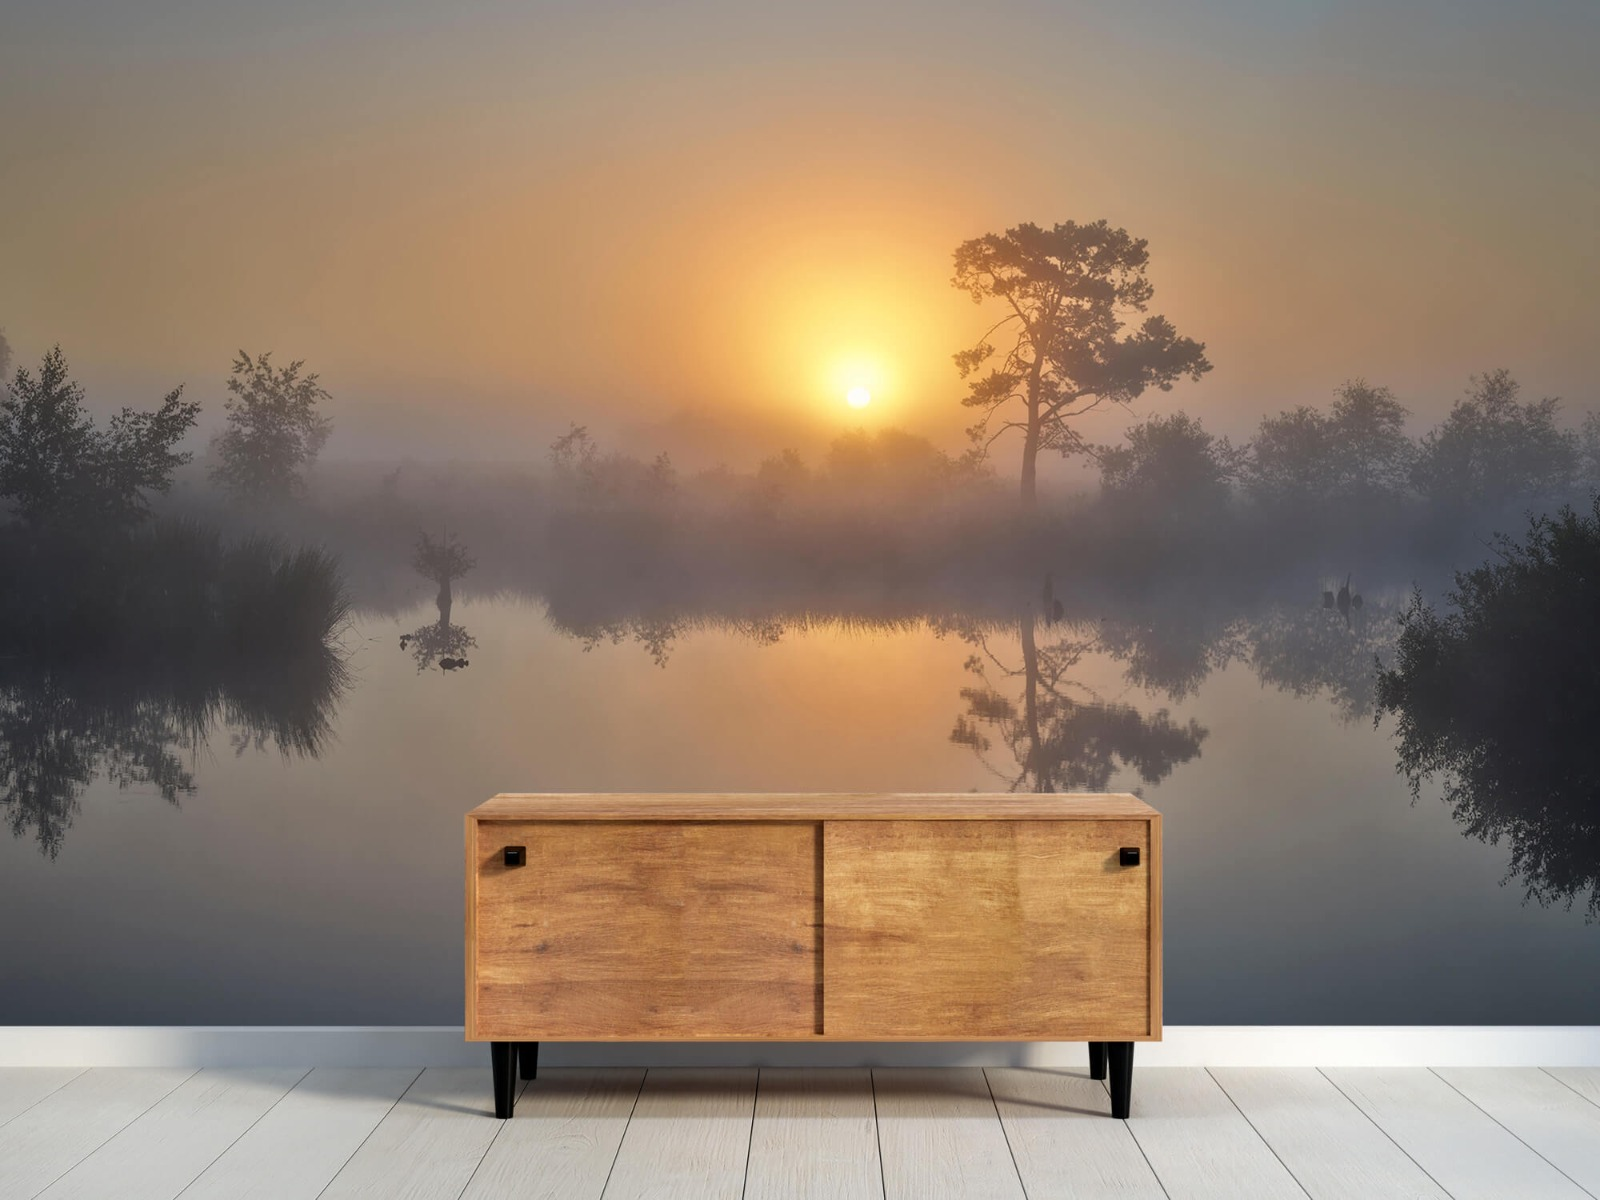 Natuur - Mistige zonsopkomst 10